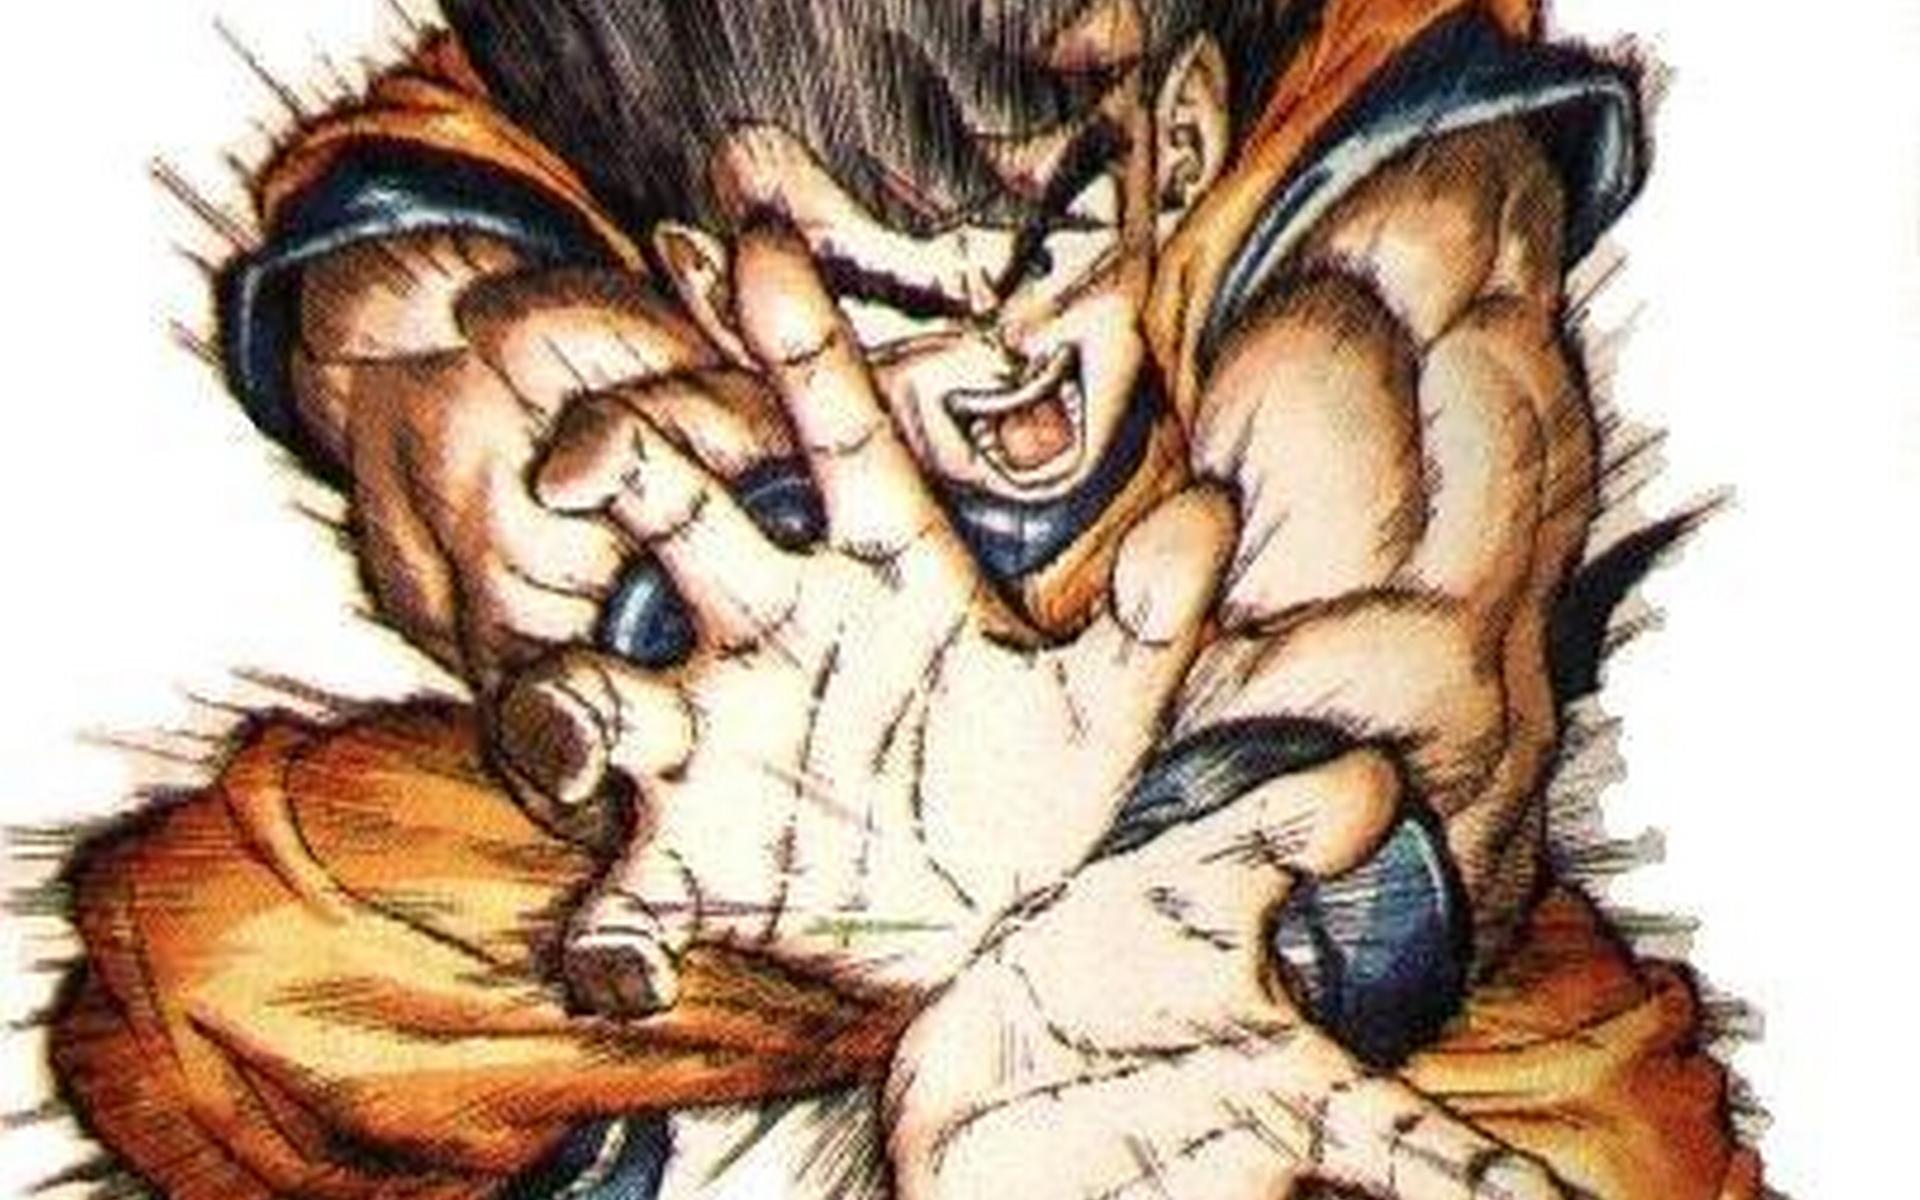 Goku Kamehameha Explosion 1920x1200